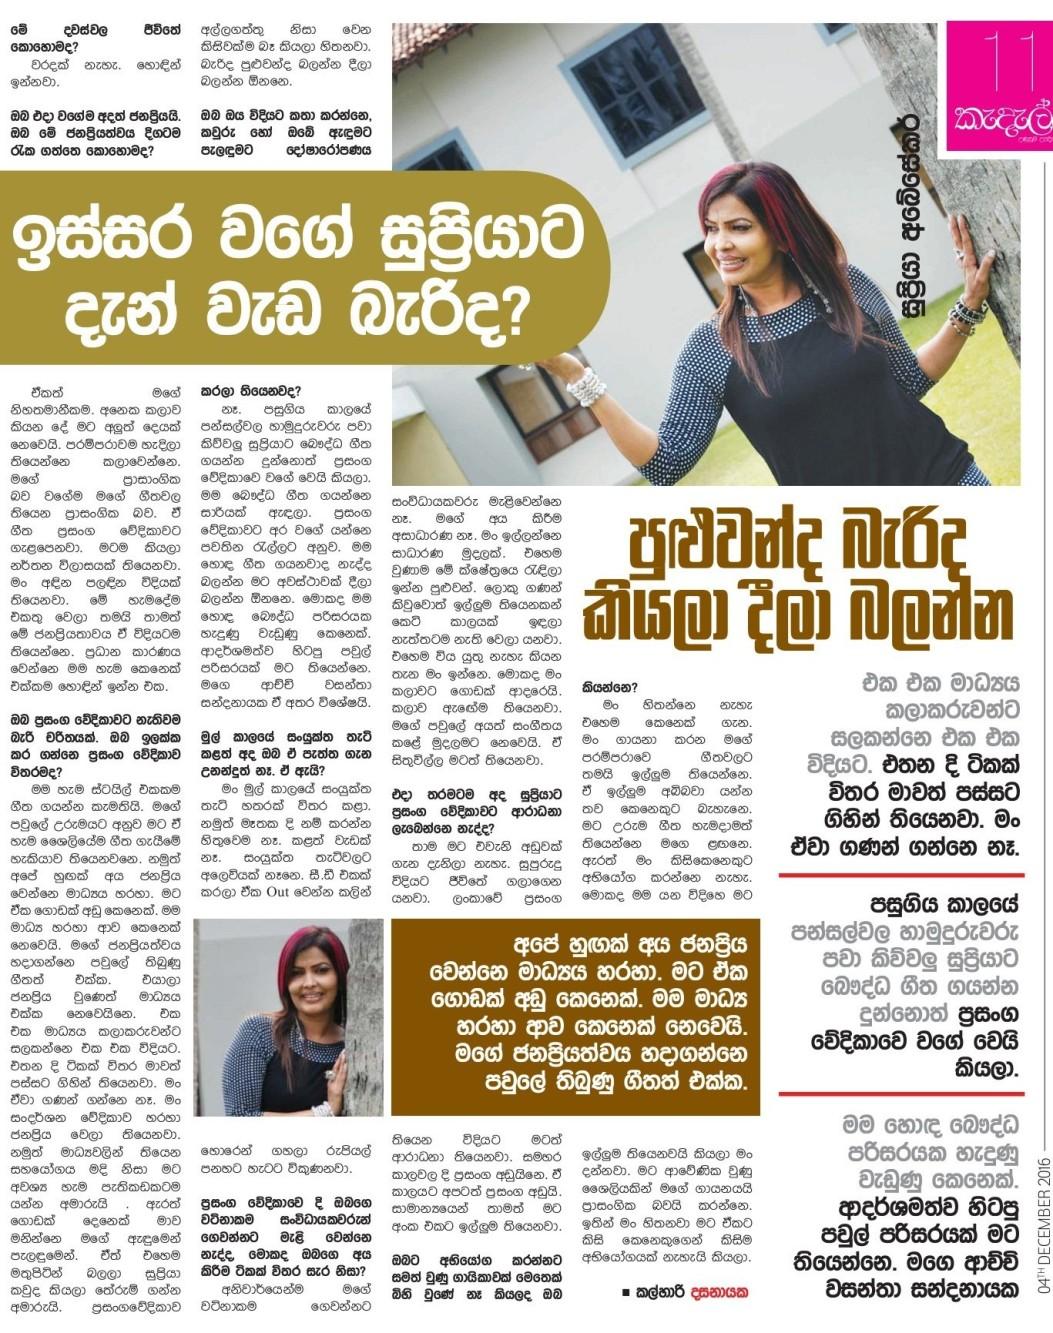 Chat with Supriya Abeysekara